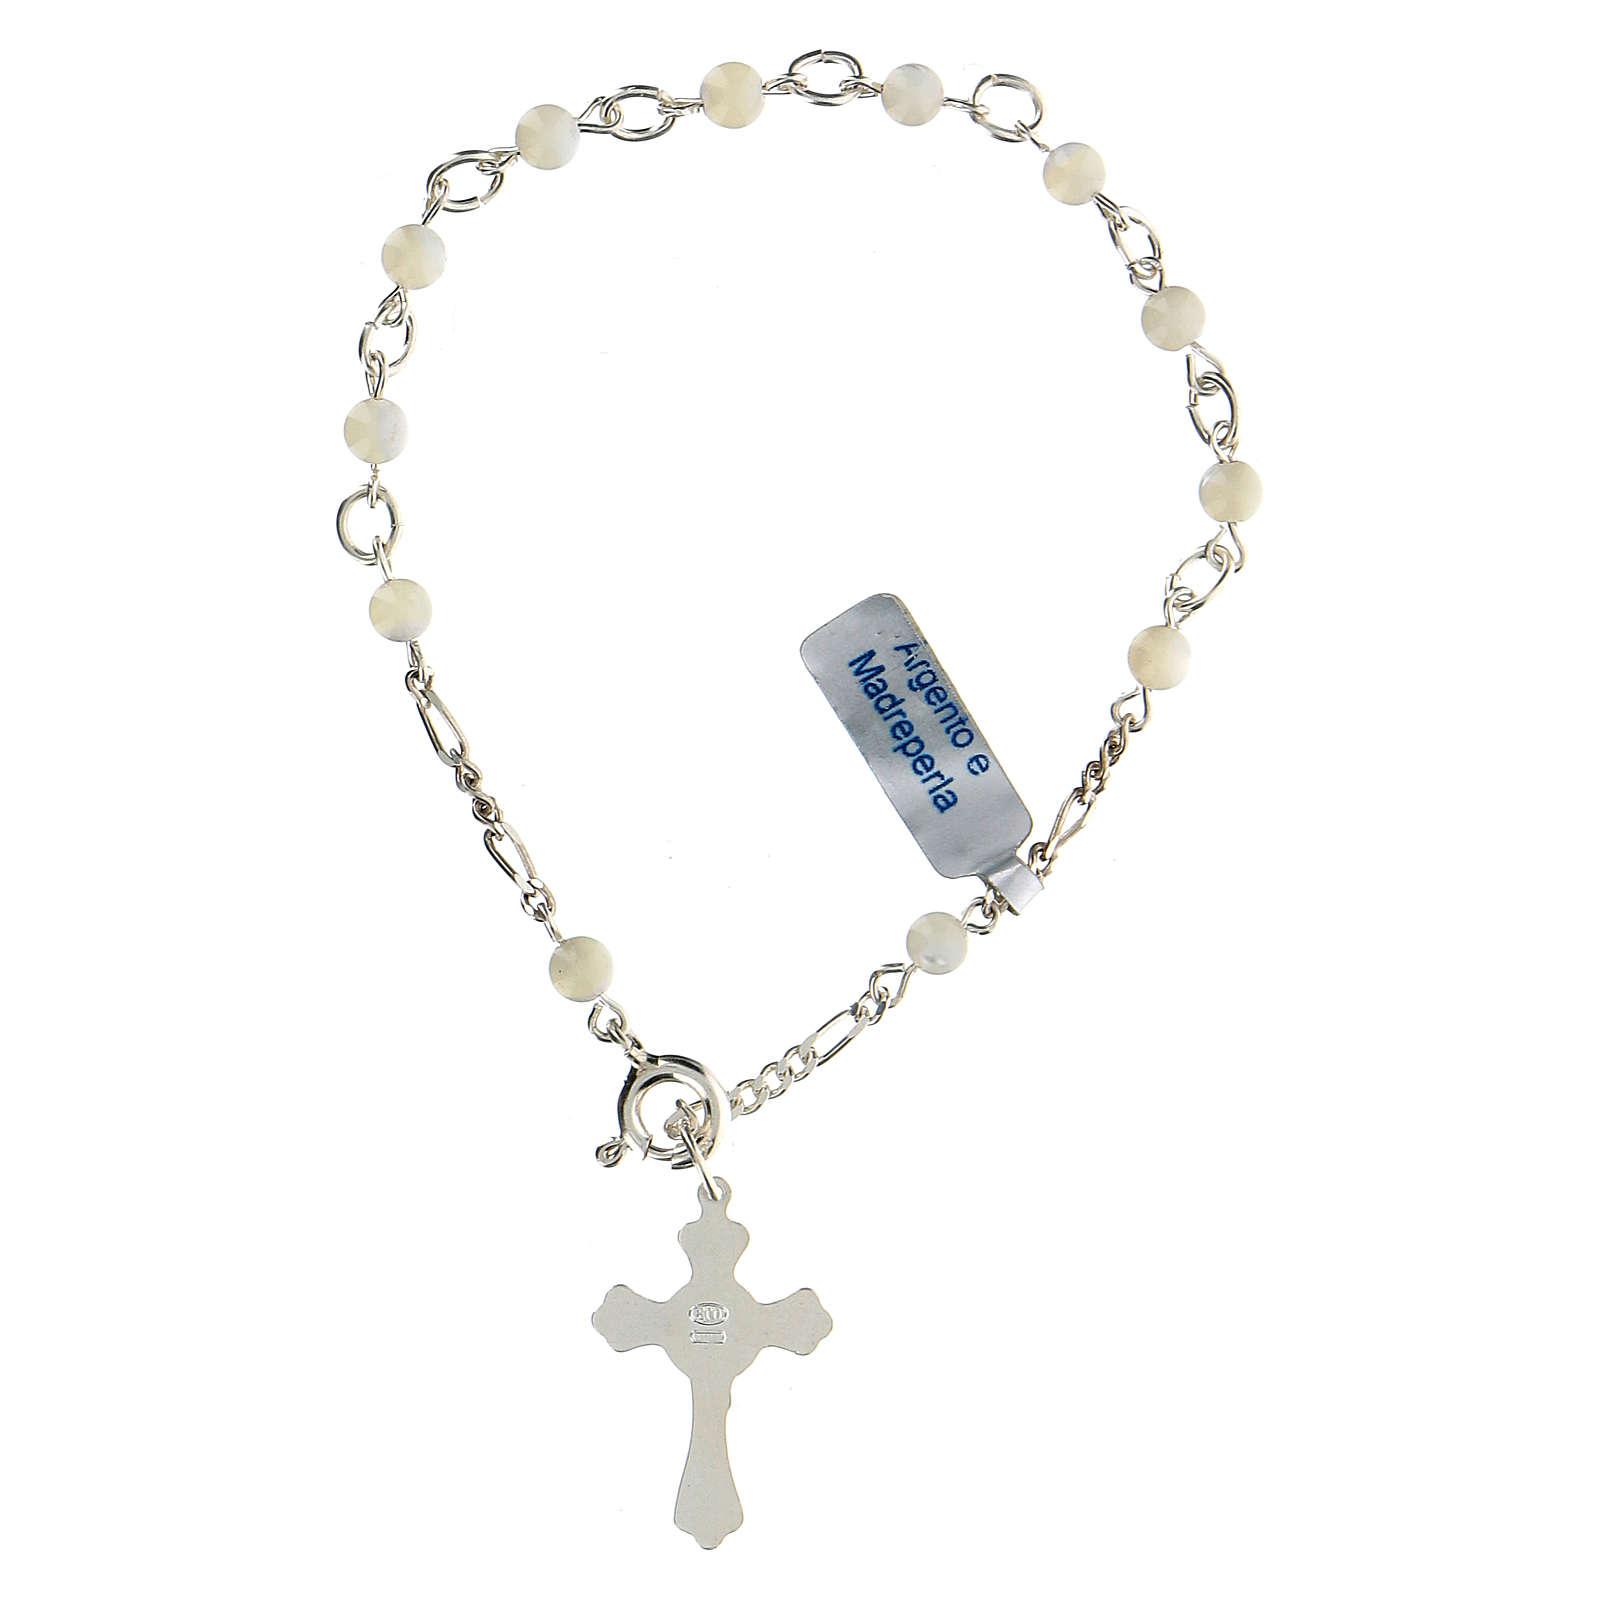 Bracciale rosario decina in argento e madreperla 4